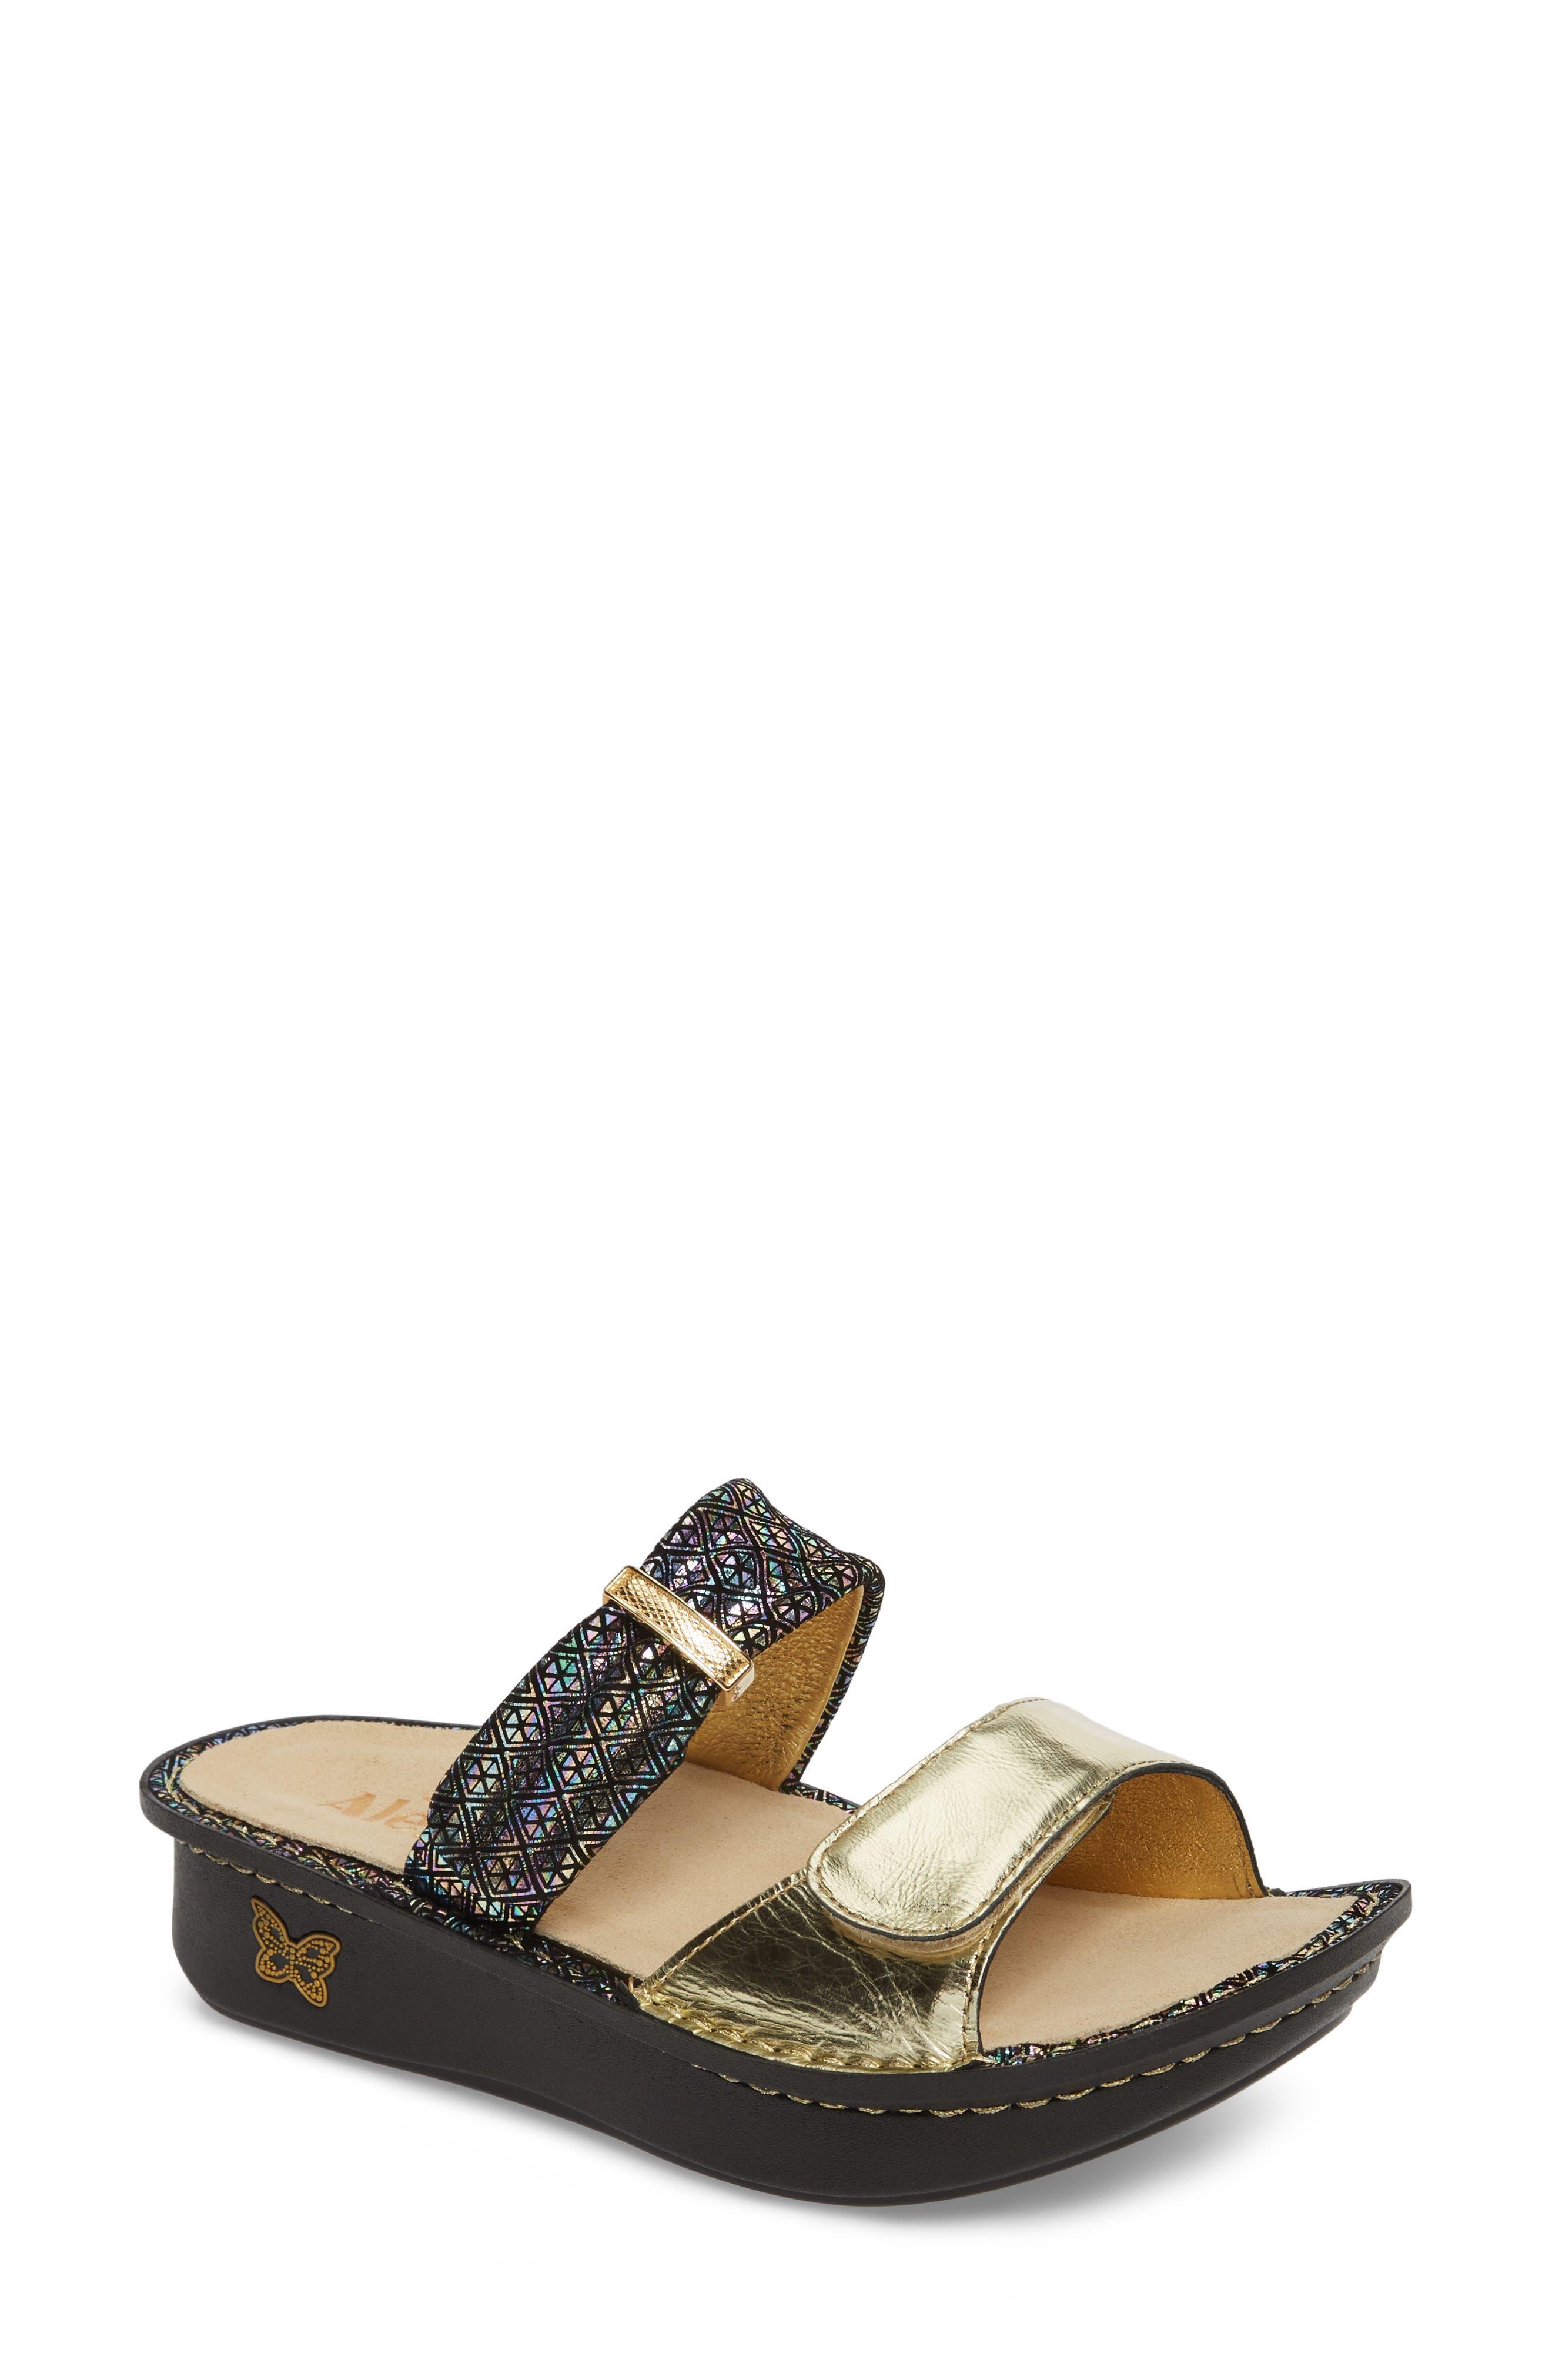 'Karmen' Sandal,                         Main,                         color, 010